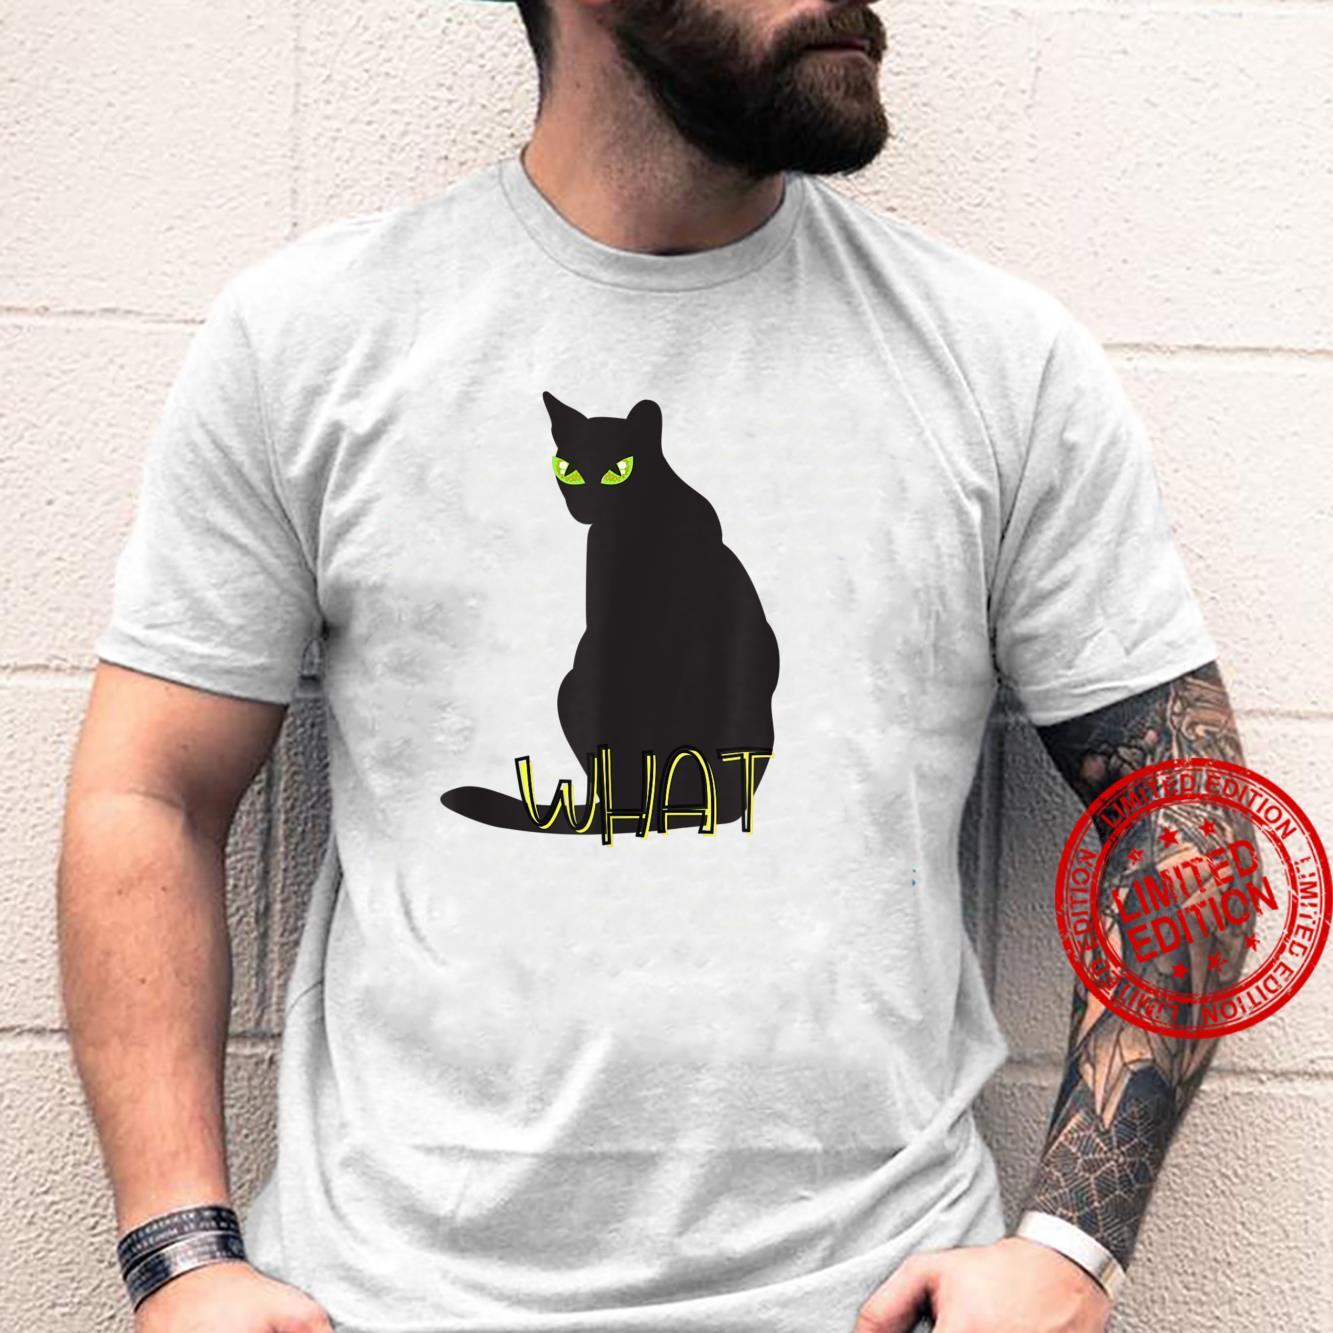 What Cat Shirt